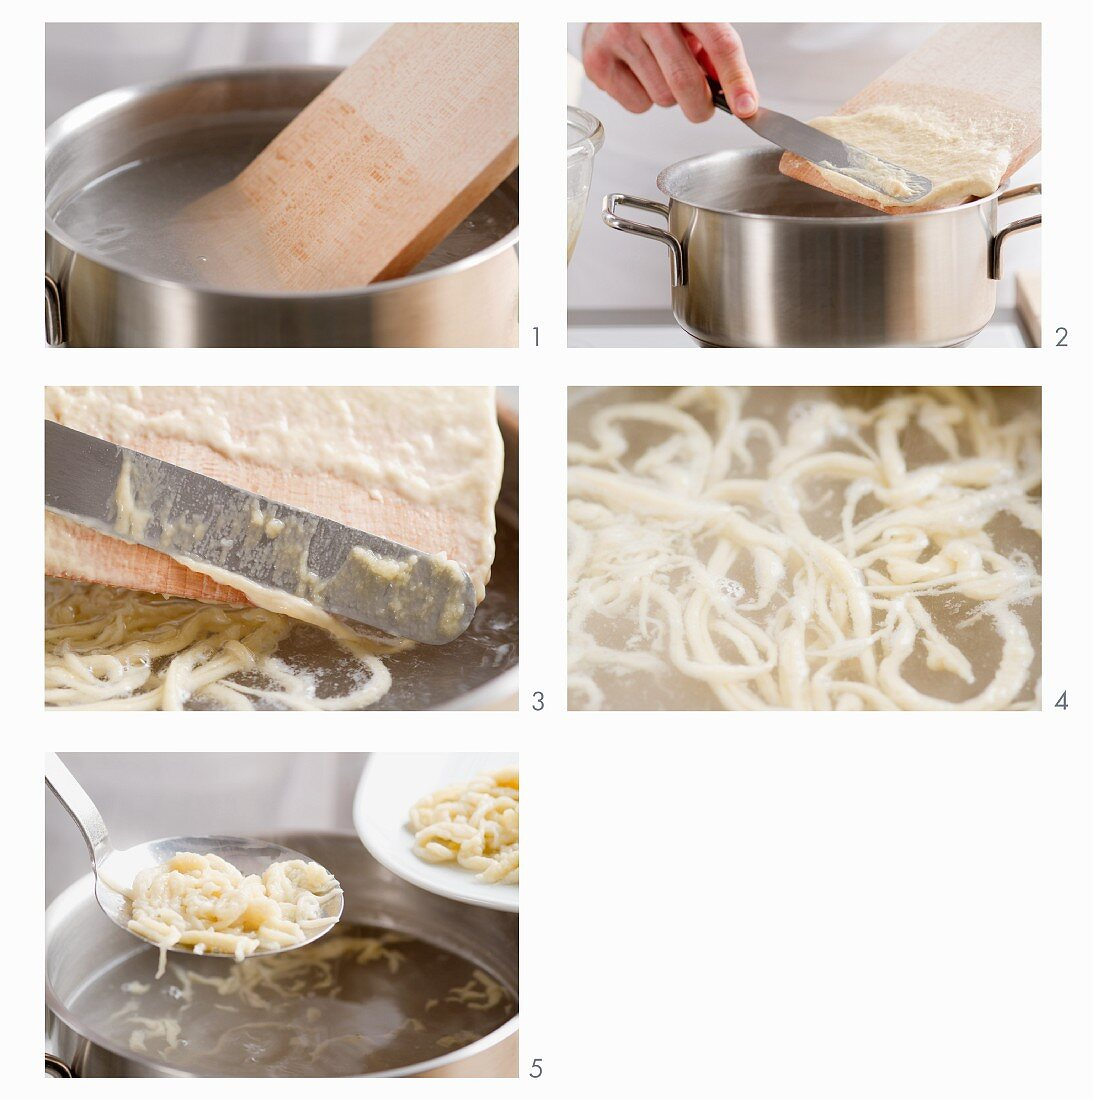 Hand cut Spätzle (soft egg noodles from Swabia) being boiled